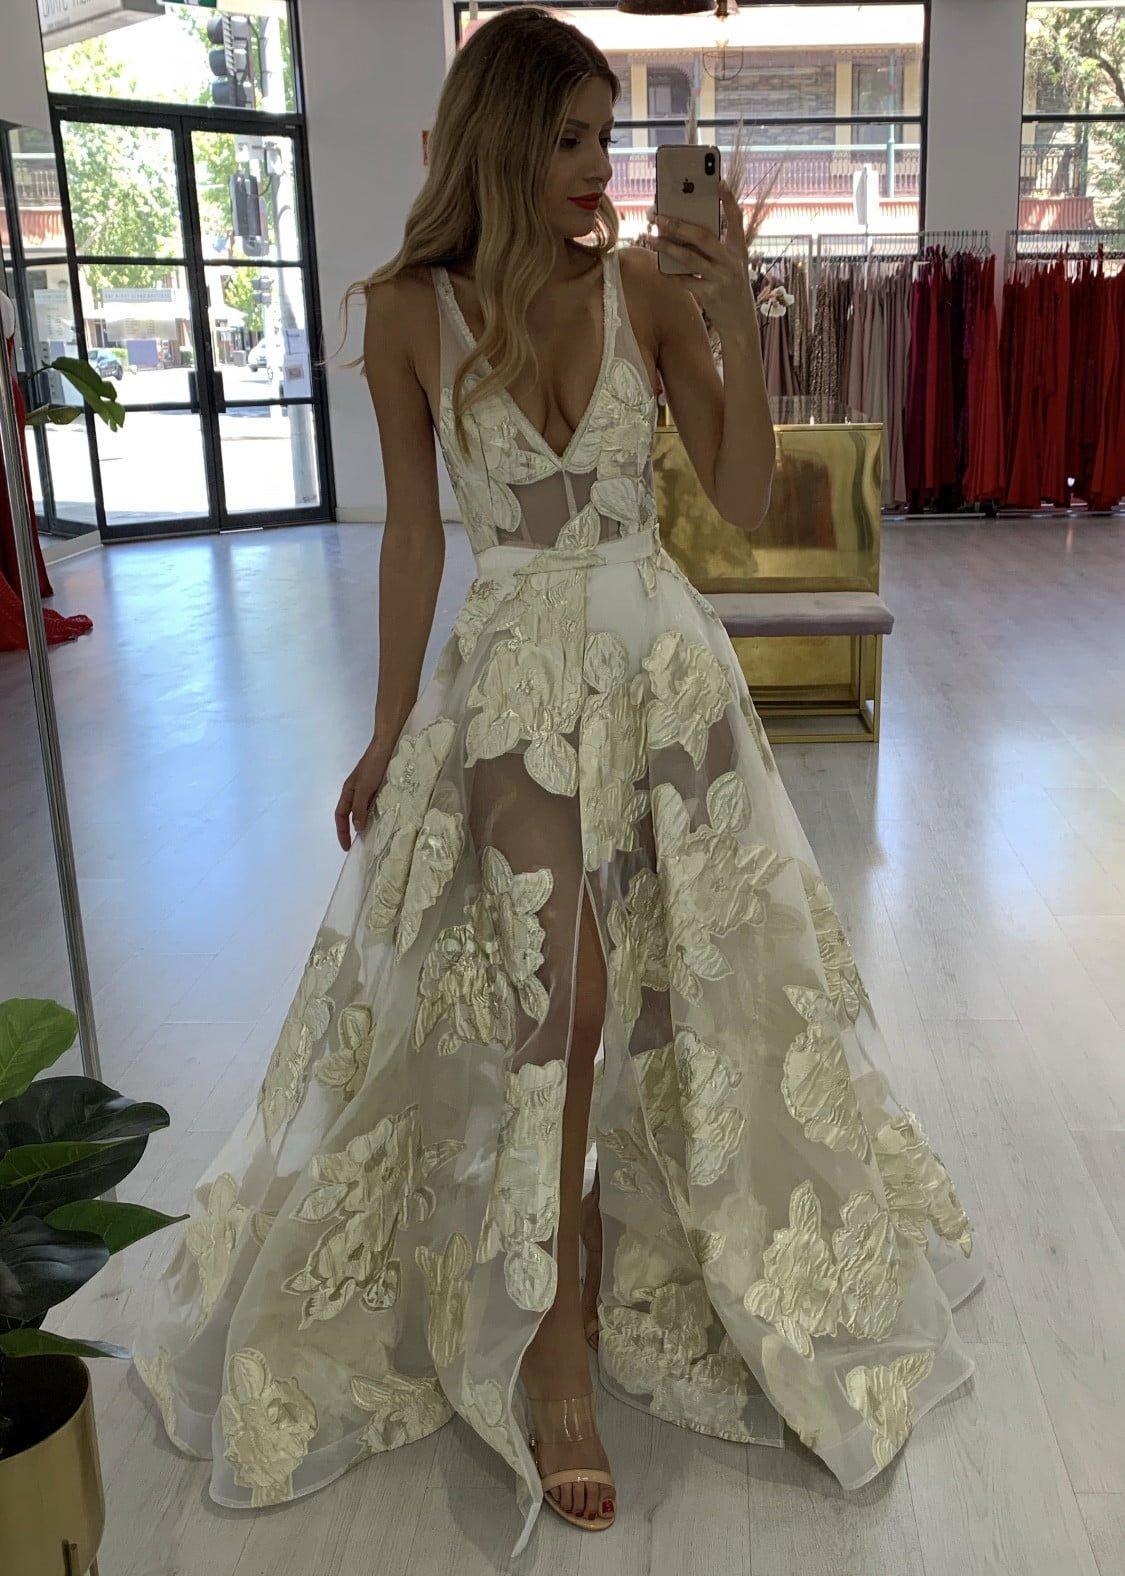 D'Lelle Eloise Gown Backless, Floor Length, V-Neck Gold